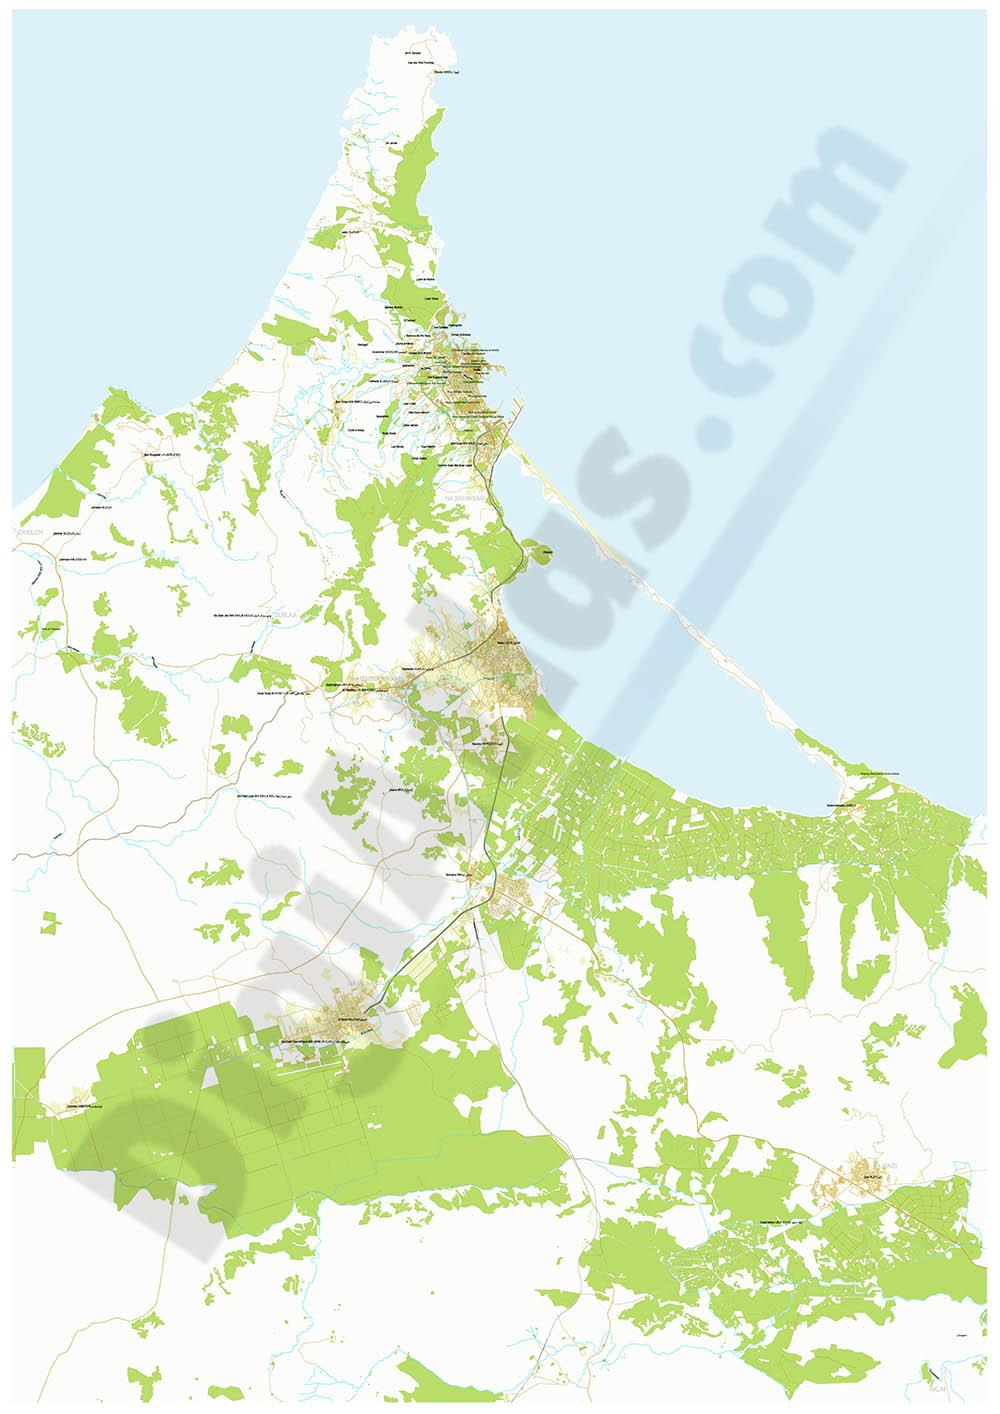 Map of Nador